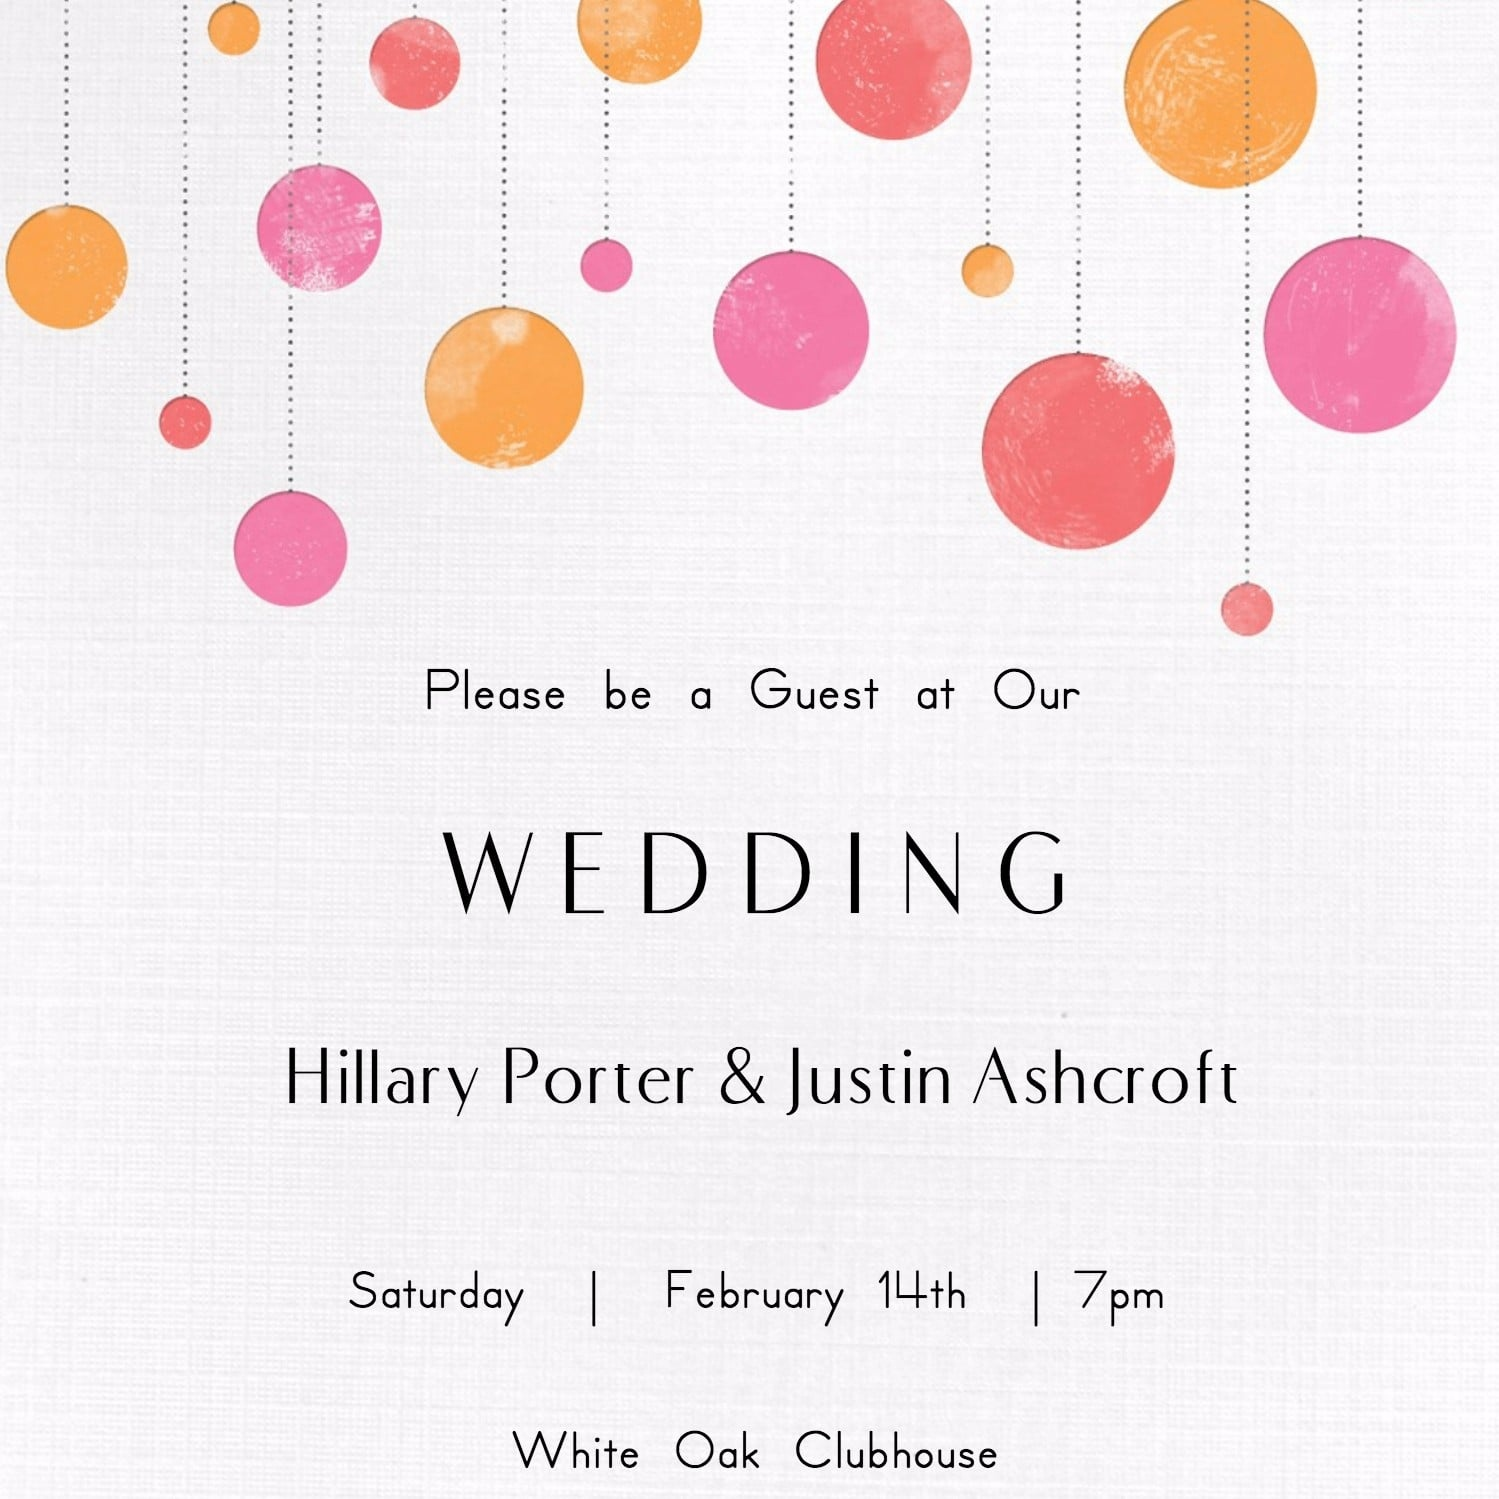 Free Printable Wedding Invitations | Popsugar Smart Living - Free Printable Monogram Wedding Invitation Templates